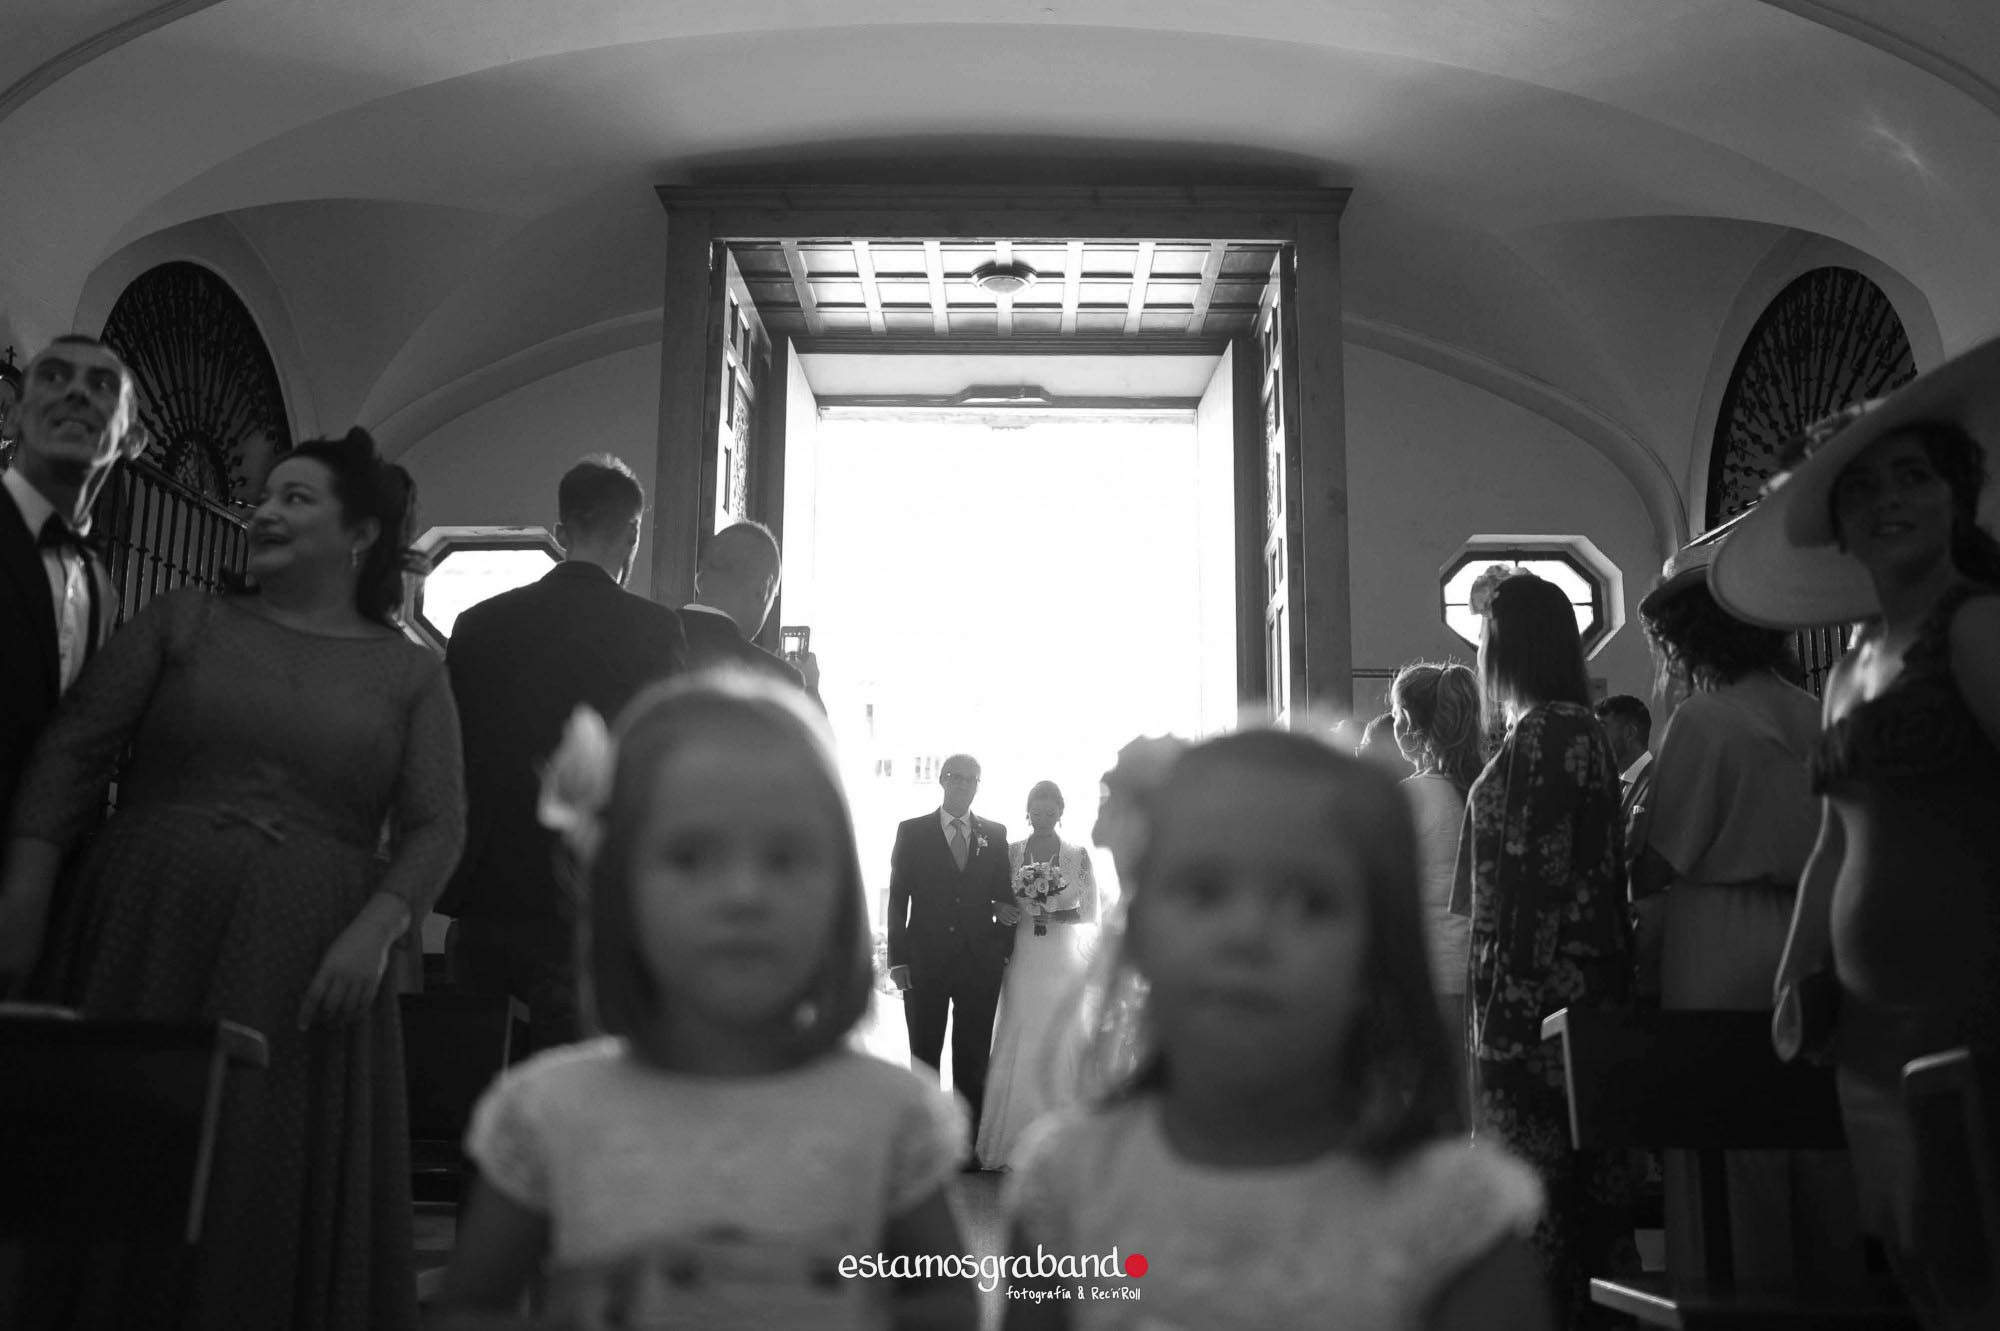 Demo-2017-Fotografía-de-Boda-56 Fotografía de Bodas Recandroller - video boda cadiz